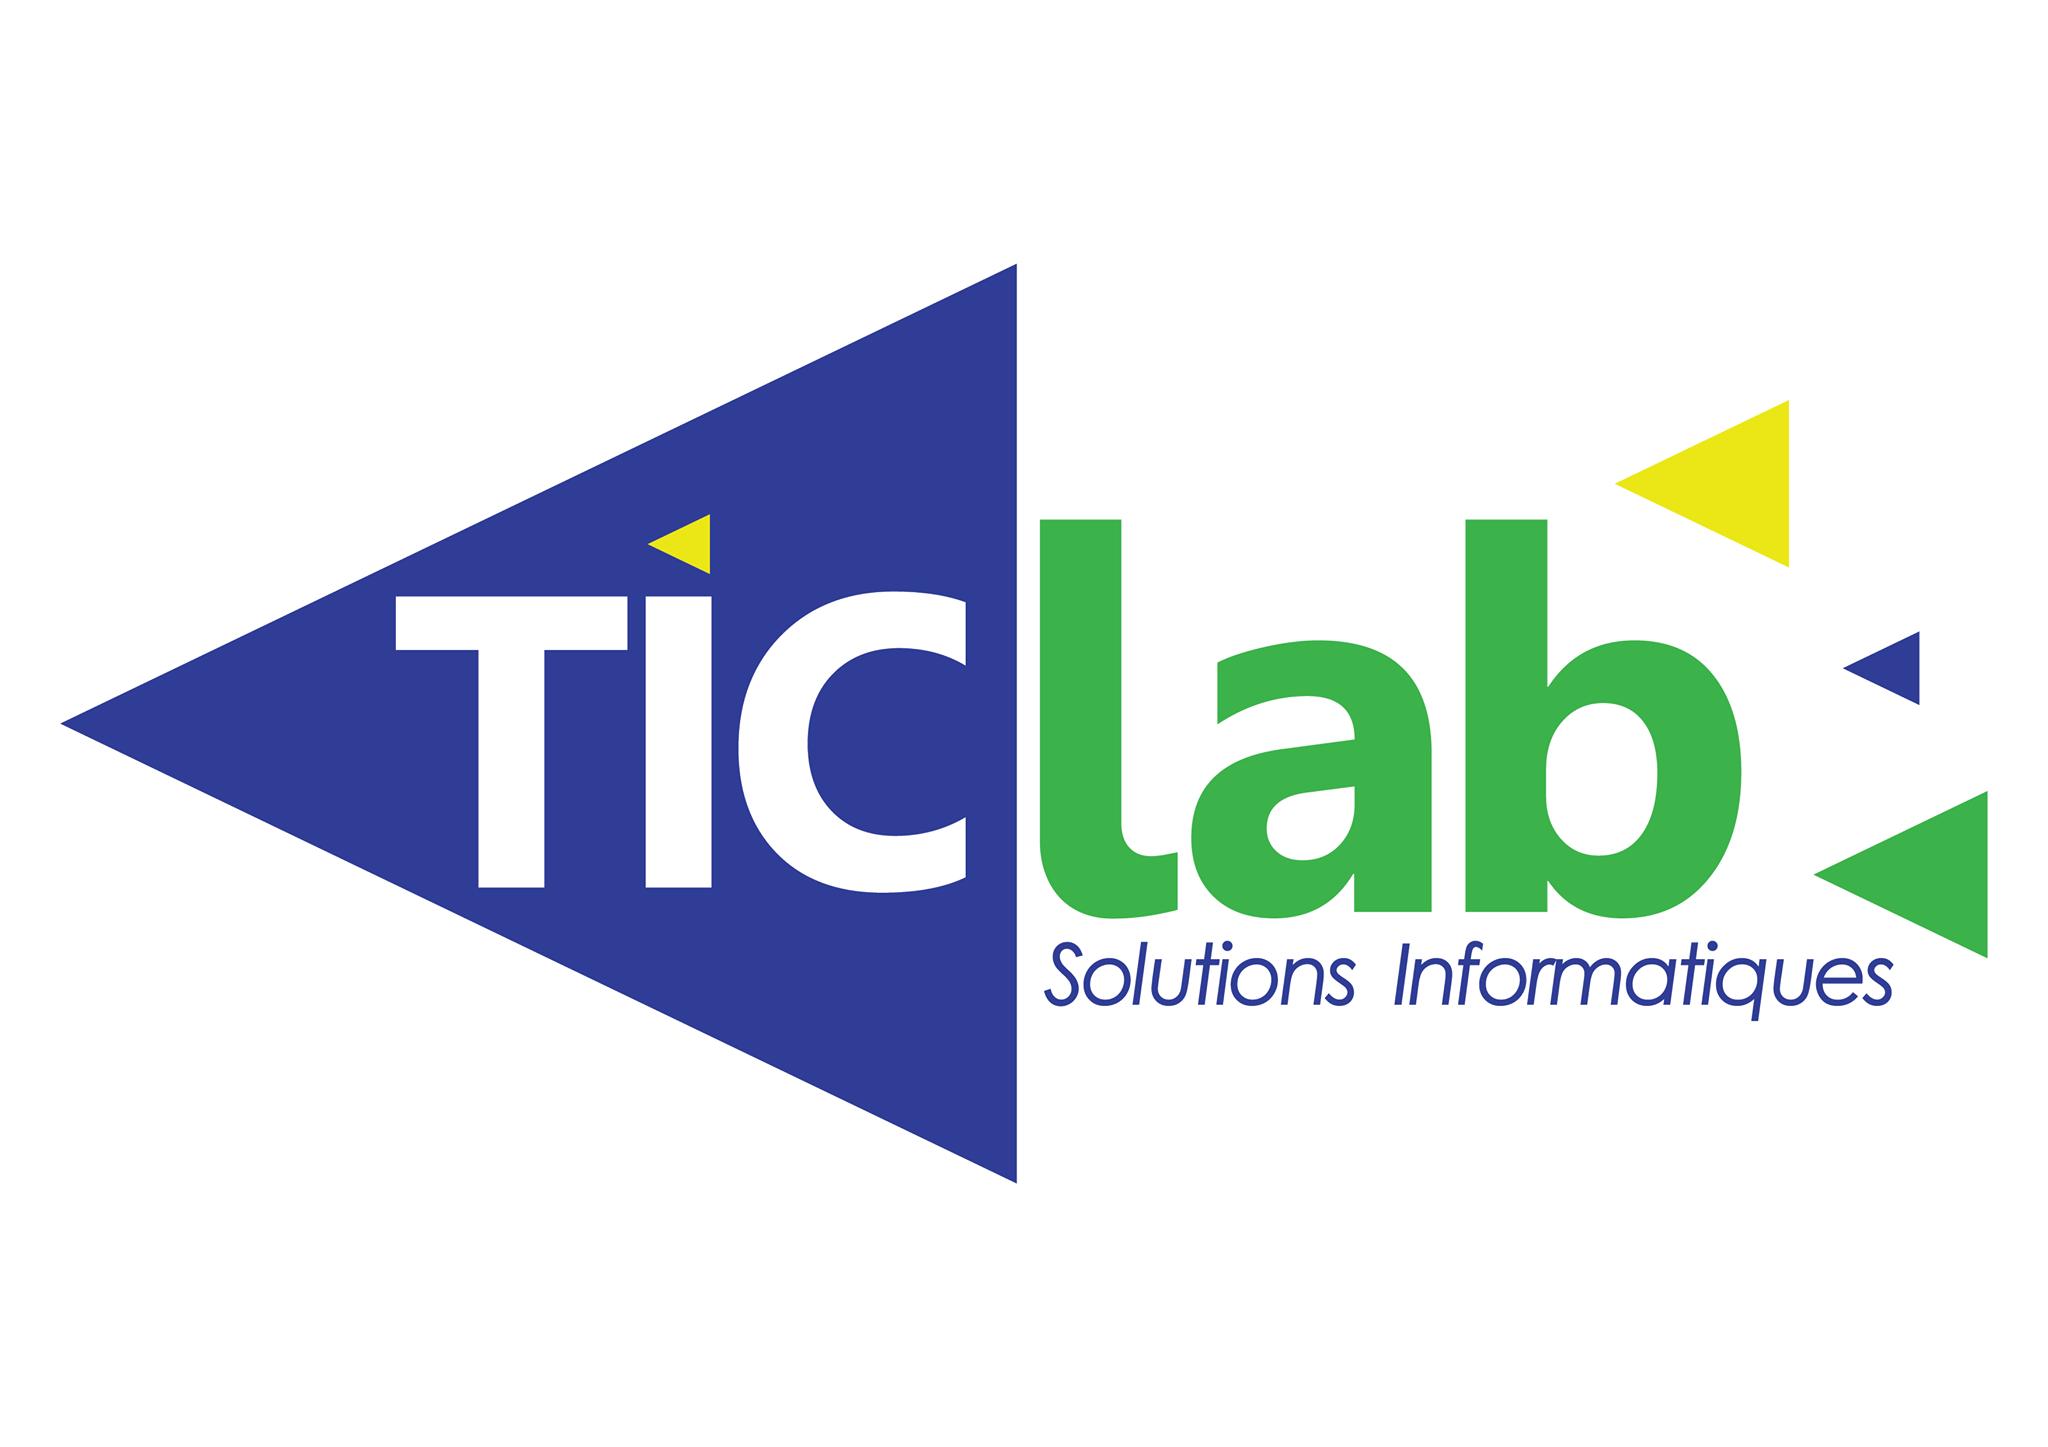 logo-ticlab